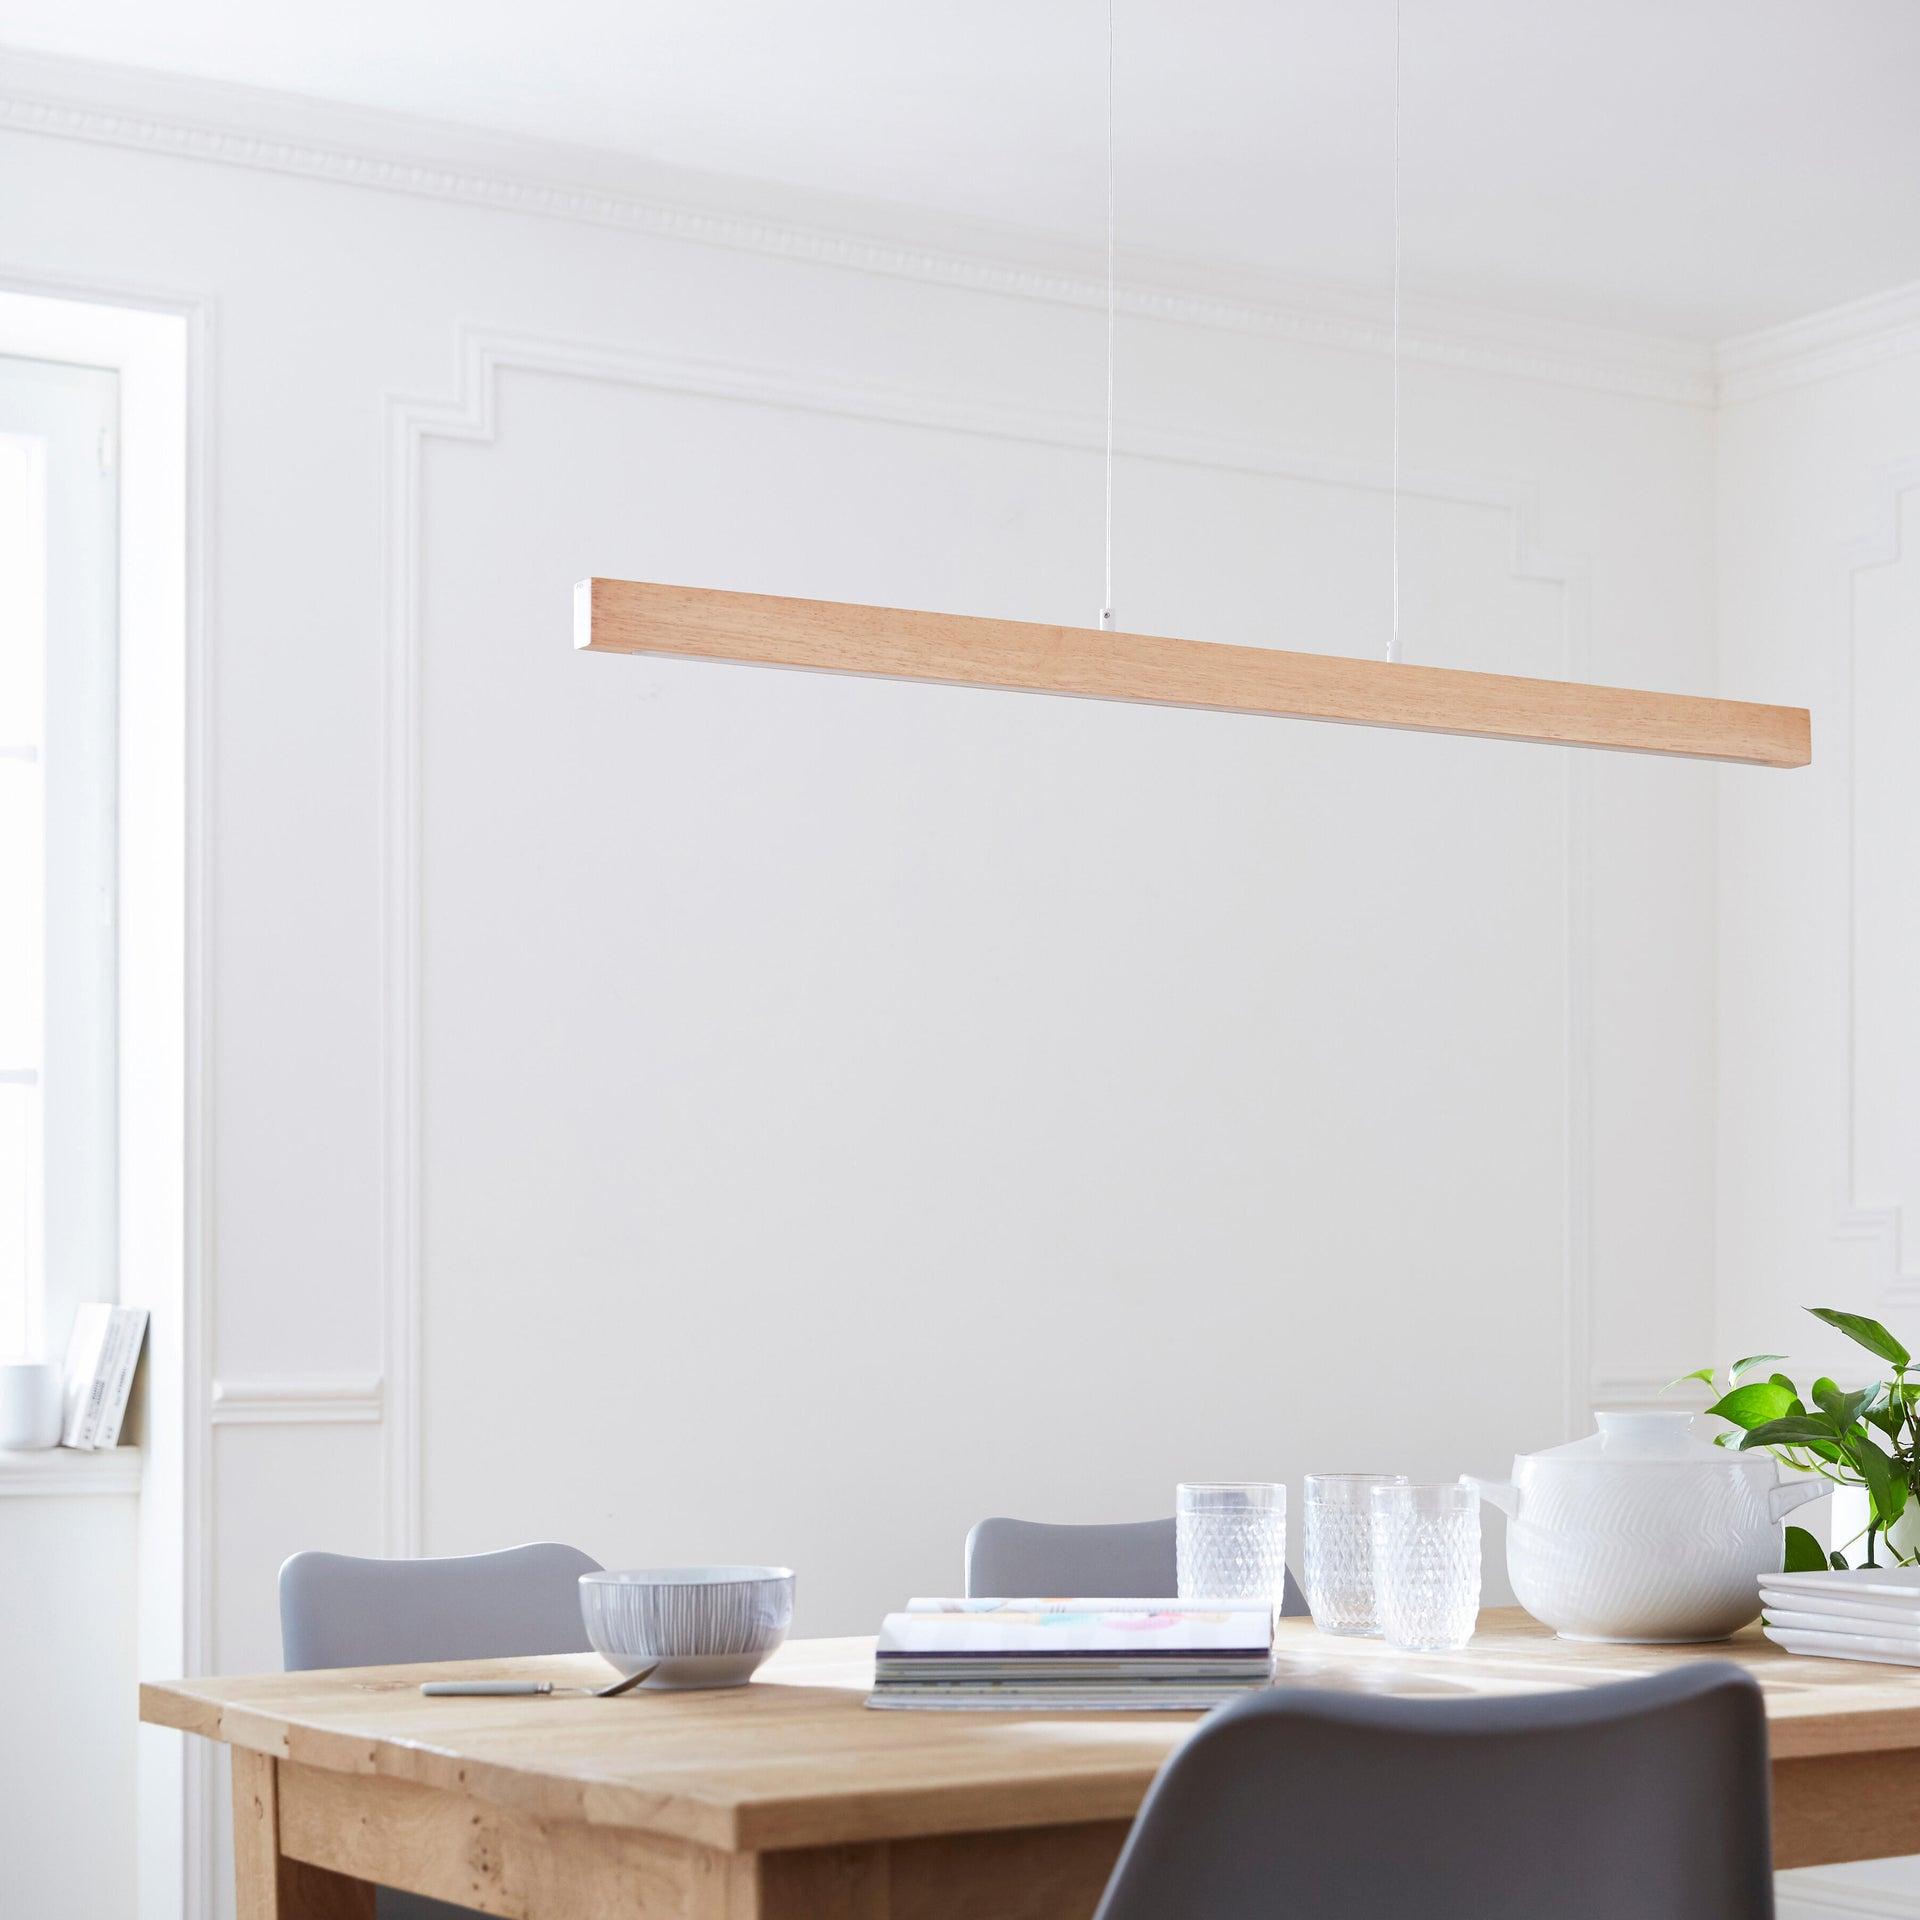 Lampadario Scandinavo Namu LED integrato legno, in legno, L. 118 cm, INSPIRE - 10